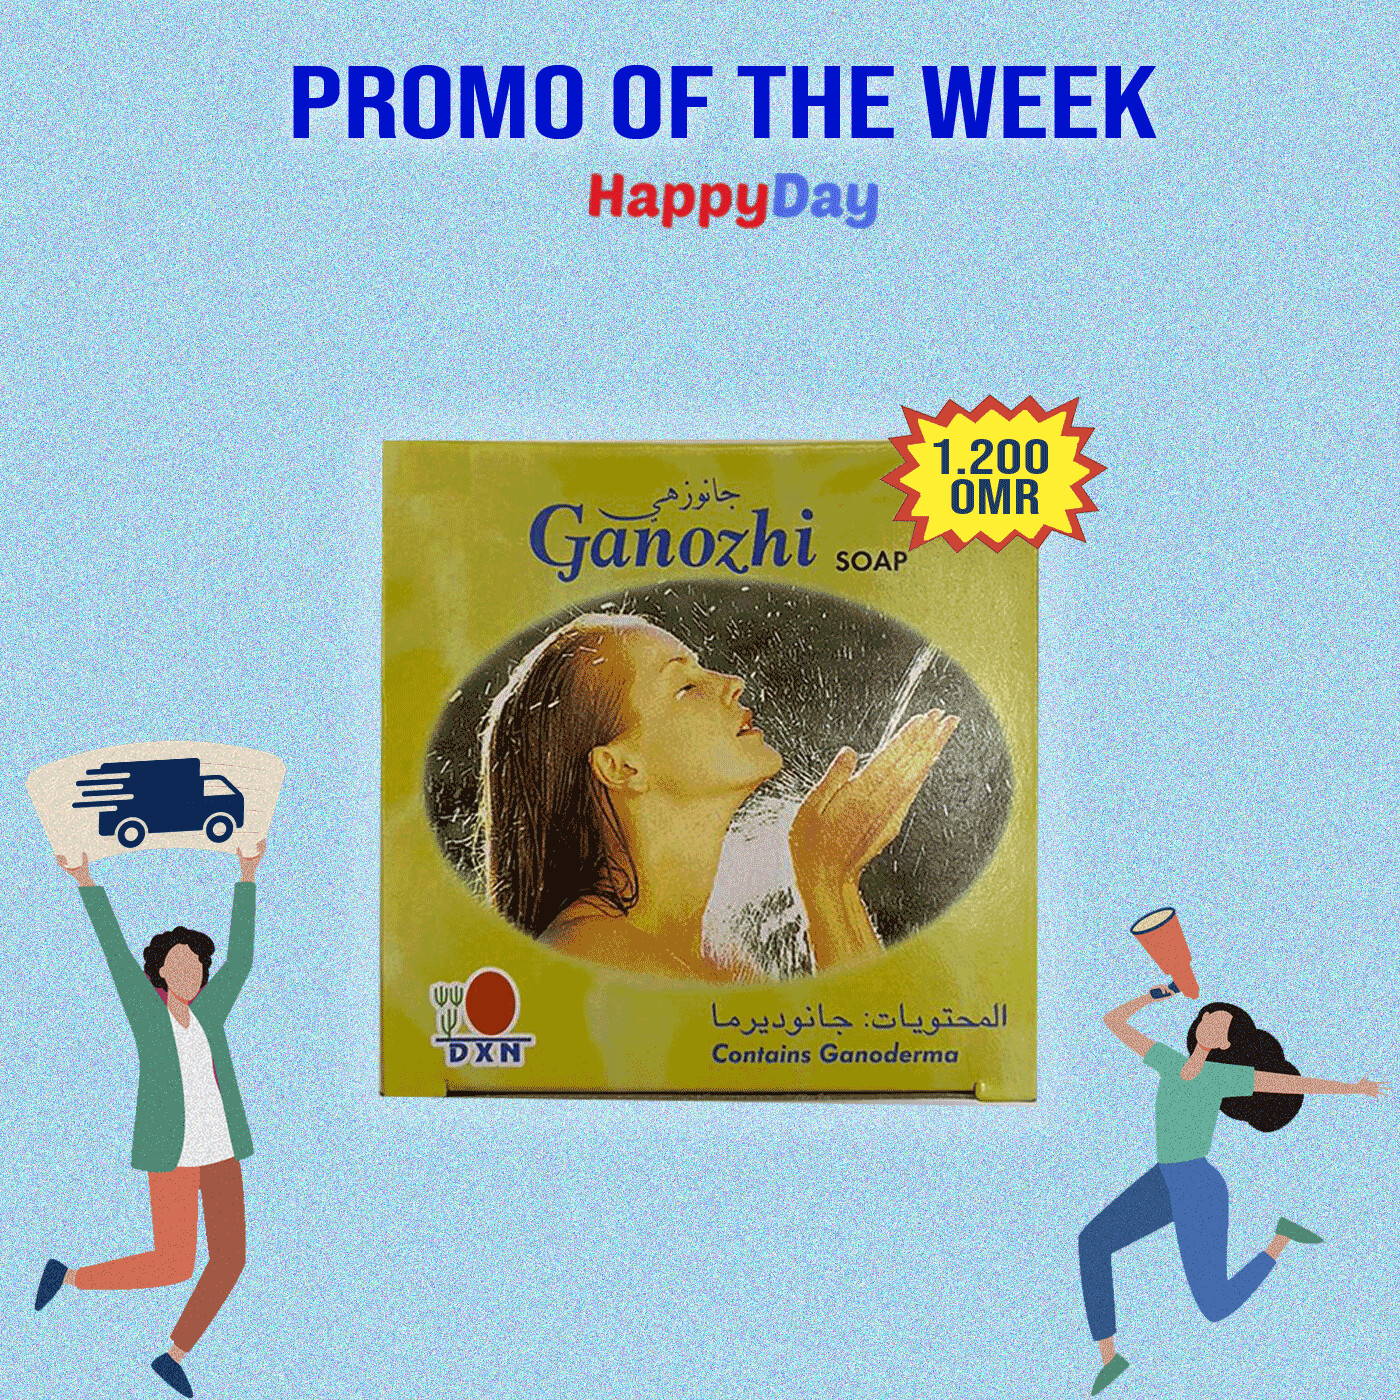 Promo Ganozhi Soap from DXN